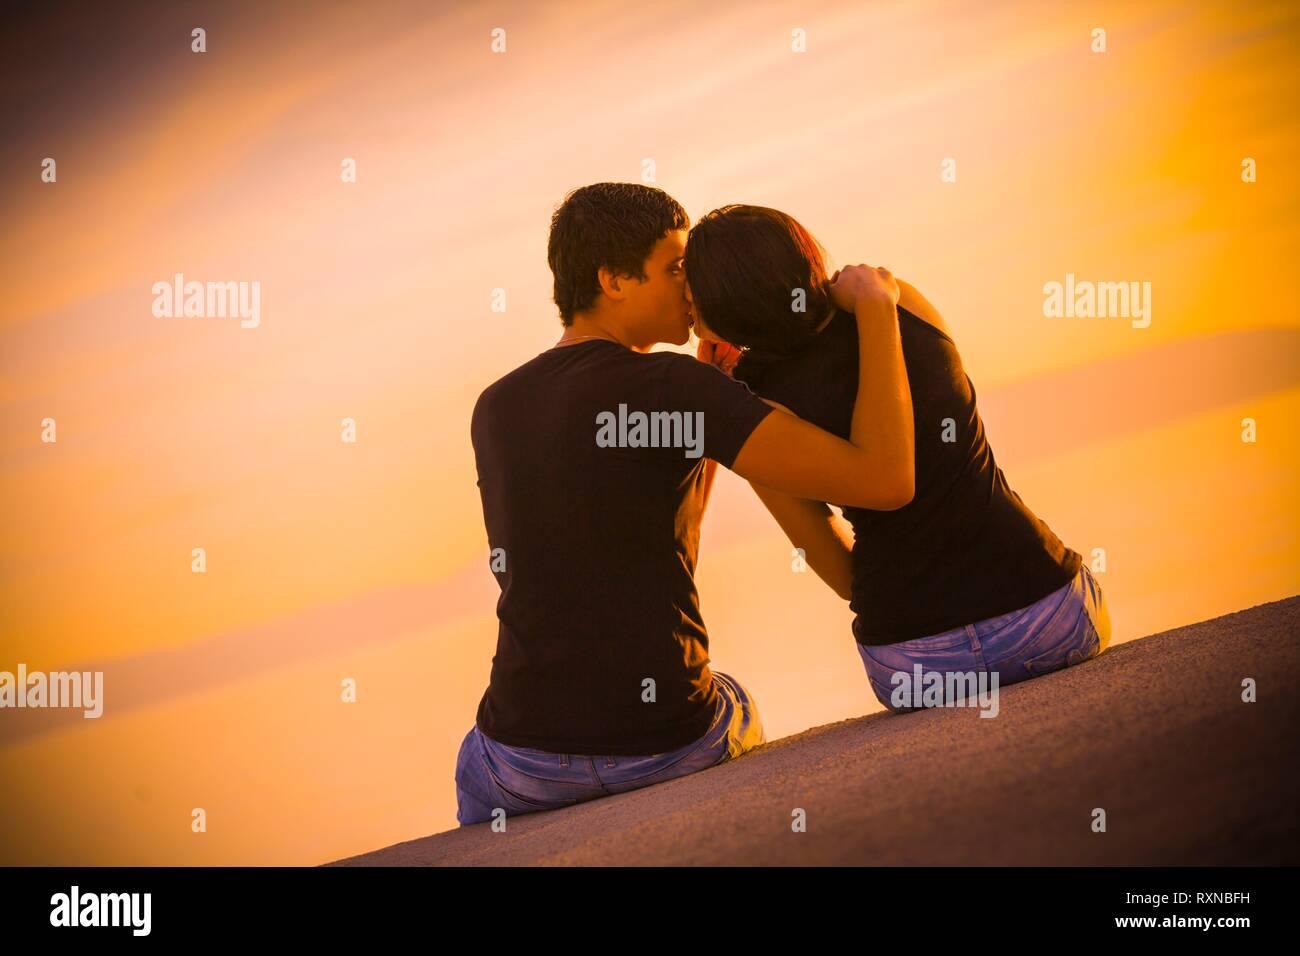 First kiss teen couple in sunset silhouette sunsetlover sunsetaddict sunsetaddicted loving love attractive beautiful female male partner - Stock Image